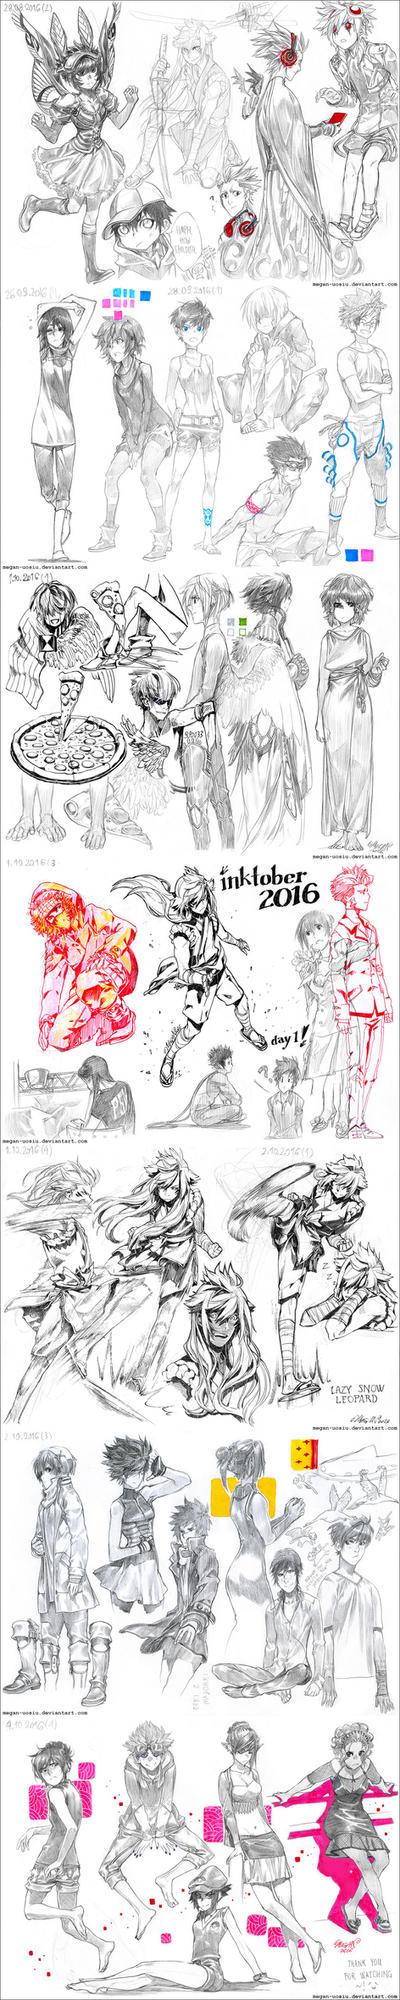 Sketches_067 by Megan-Uosiu